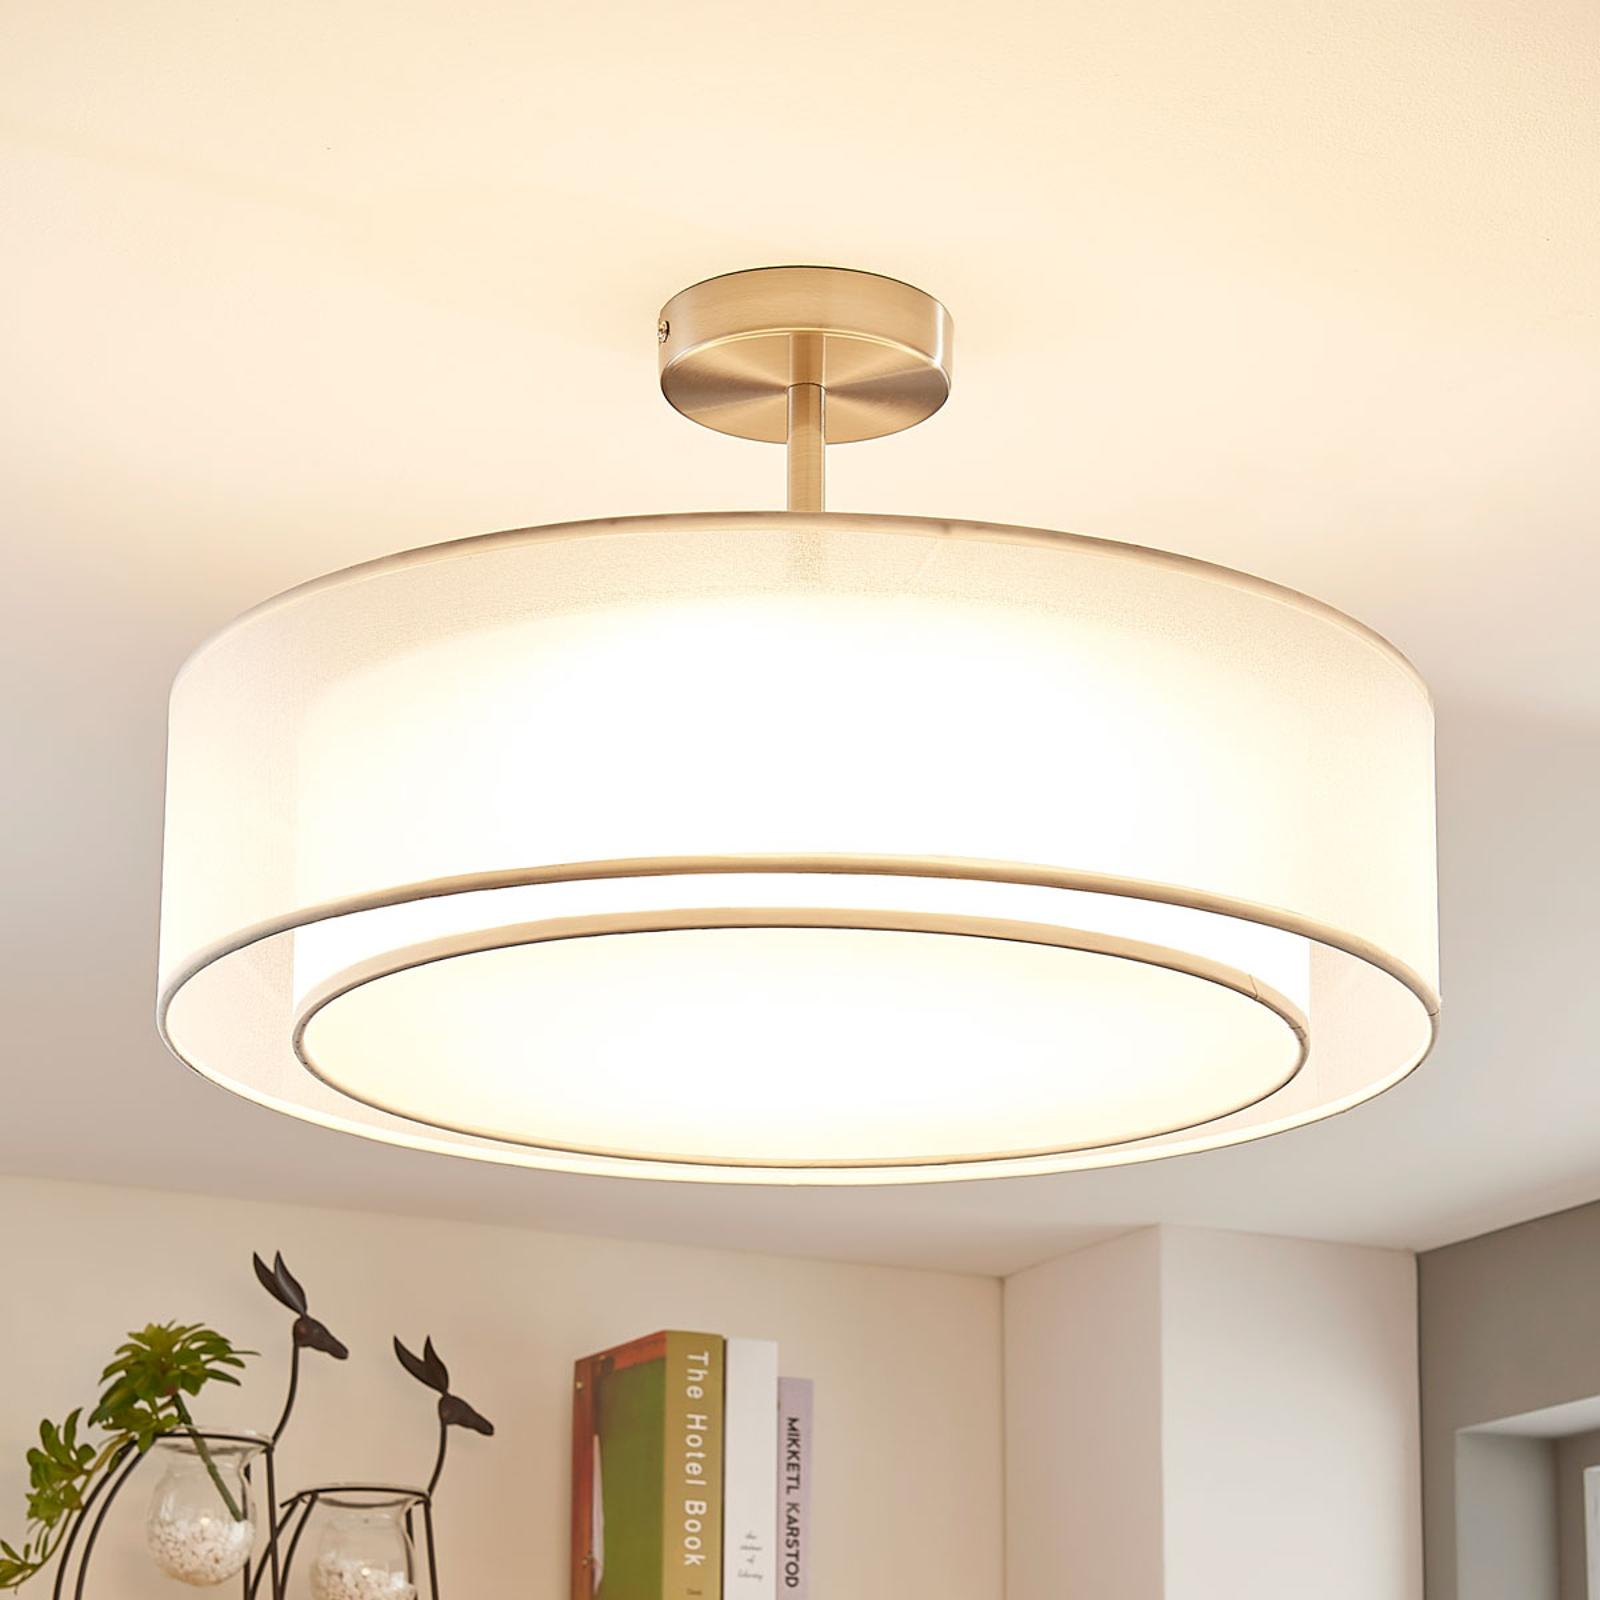 Indoor Lighting Amp Light Fittings For Indoors Lights Ie